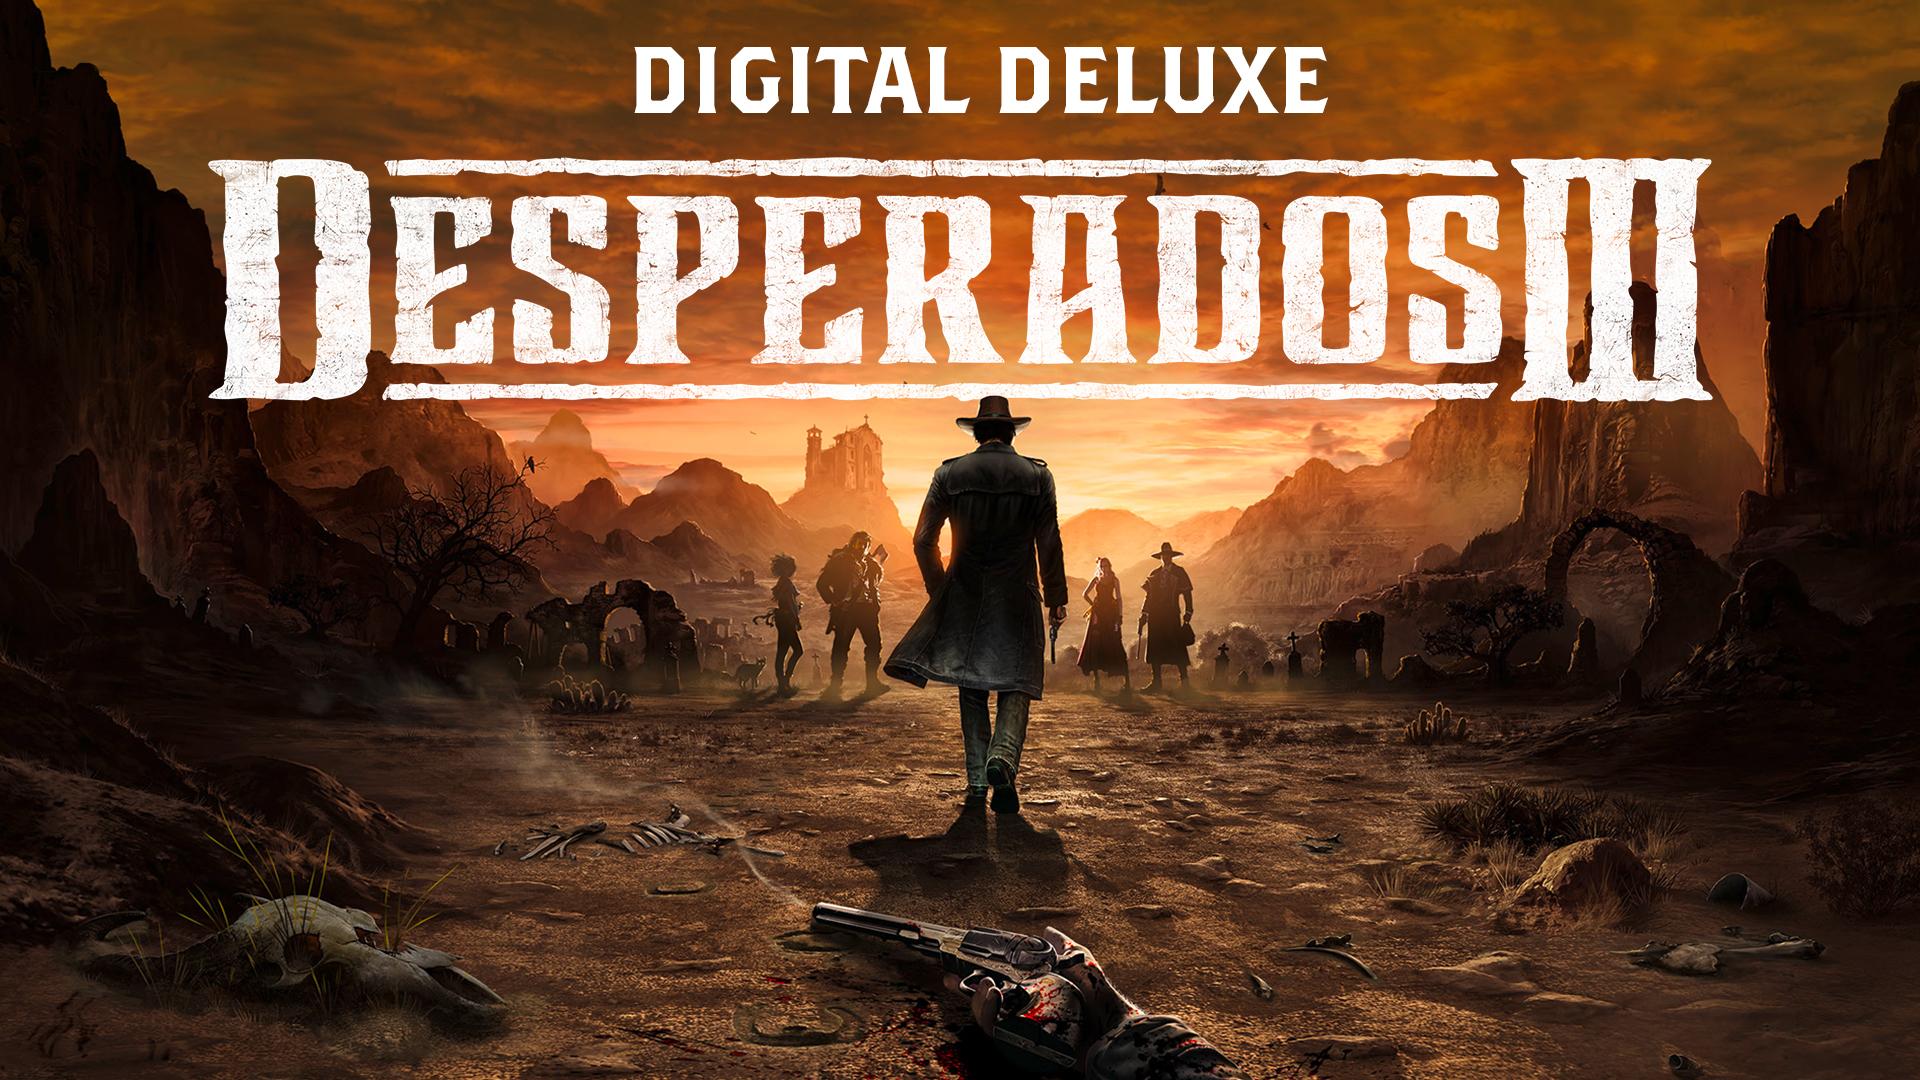 Desperados Iii Digital Deluxe Edition Pc Mac Linux Steam Game Fanatical